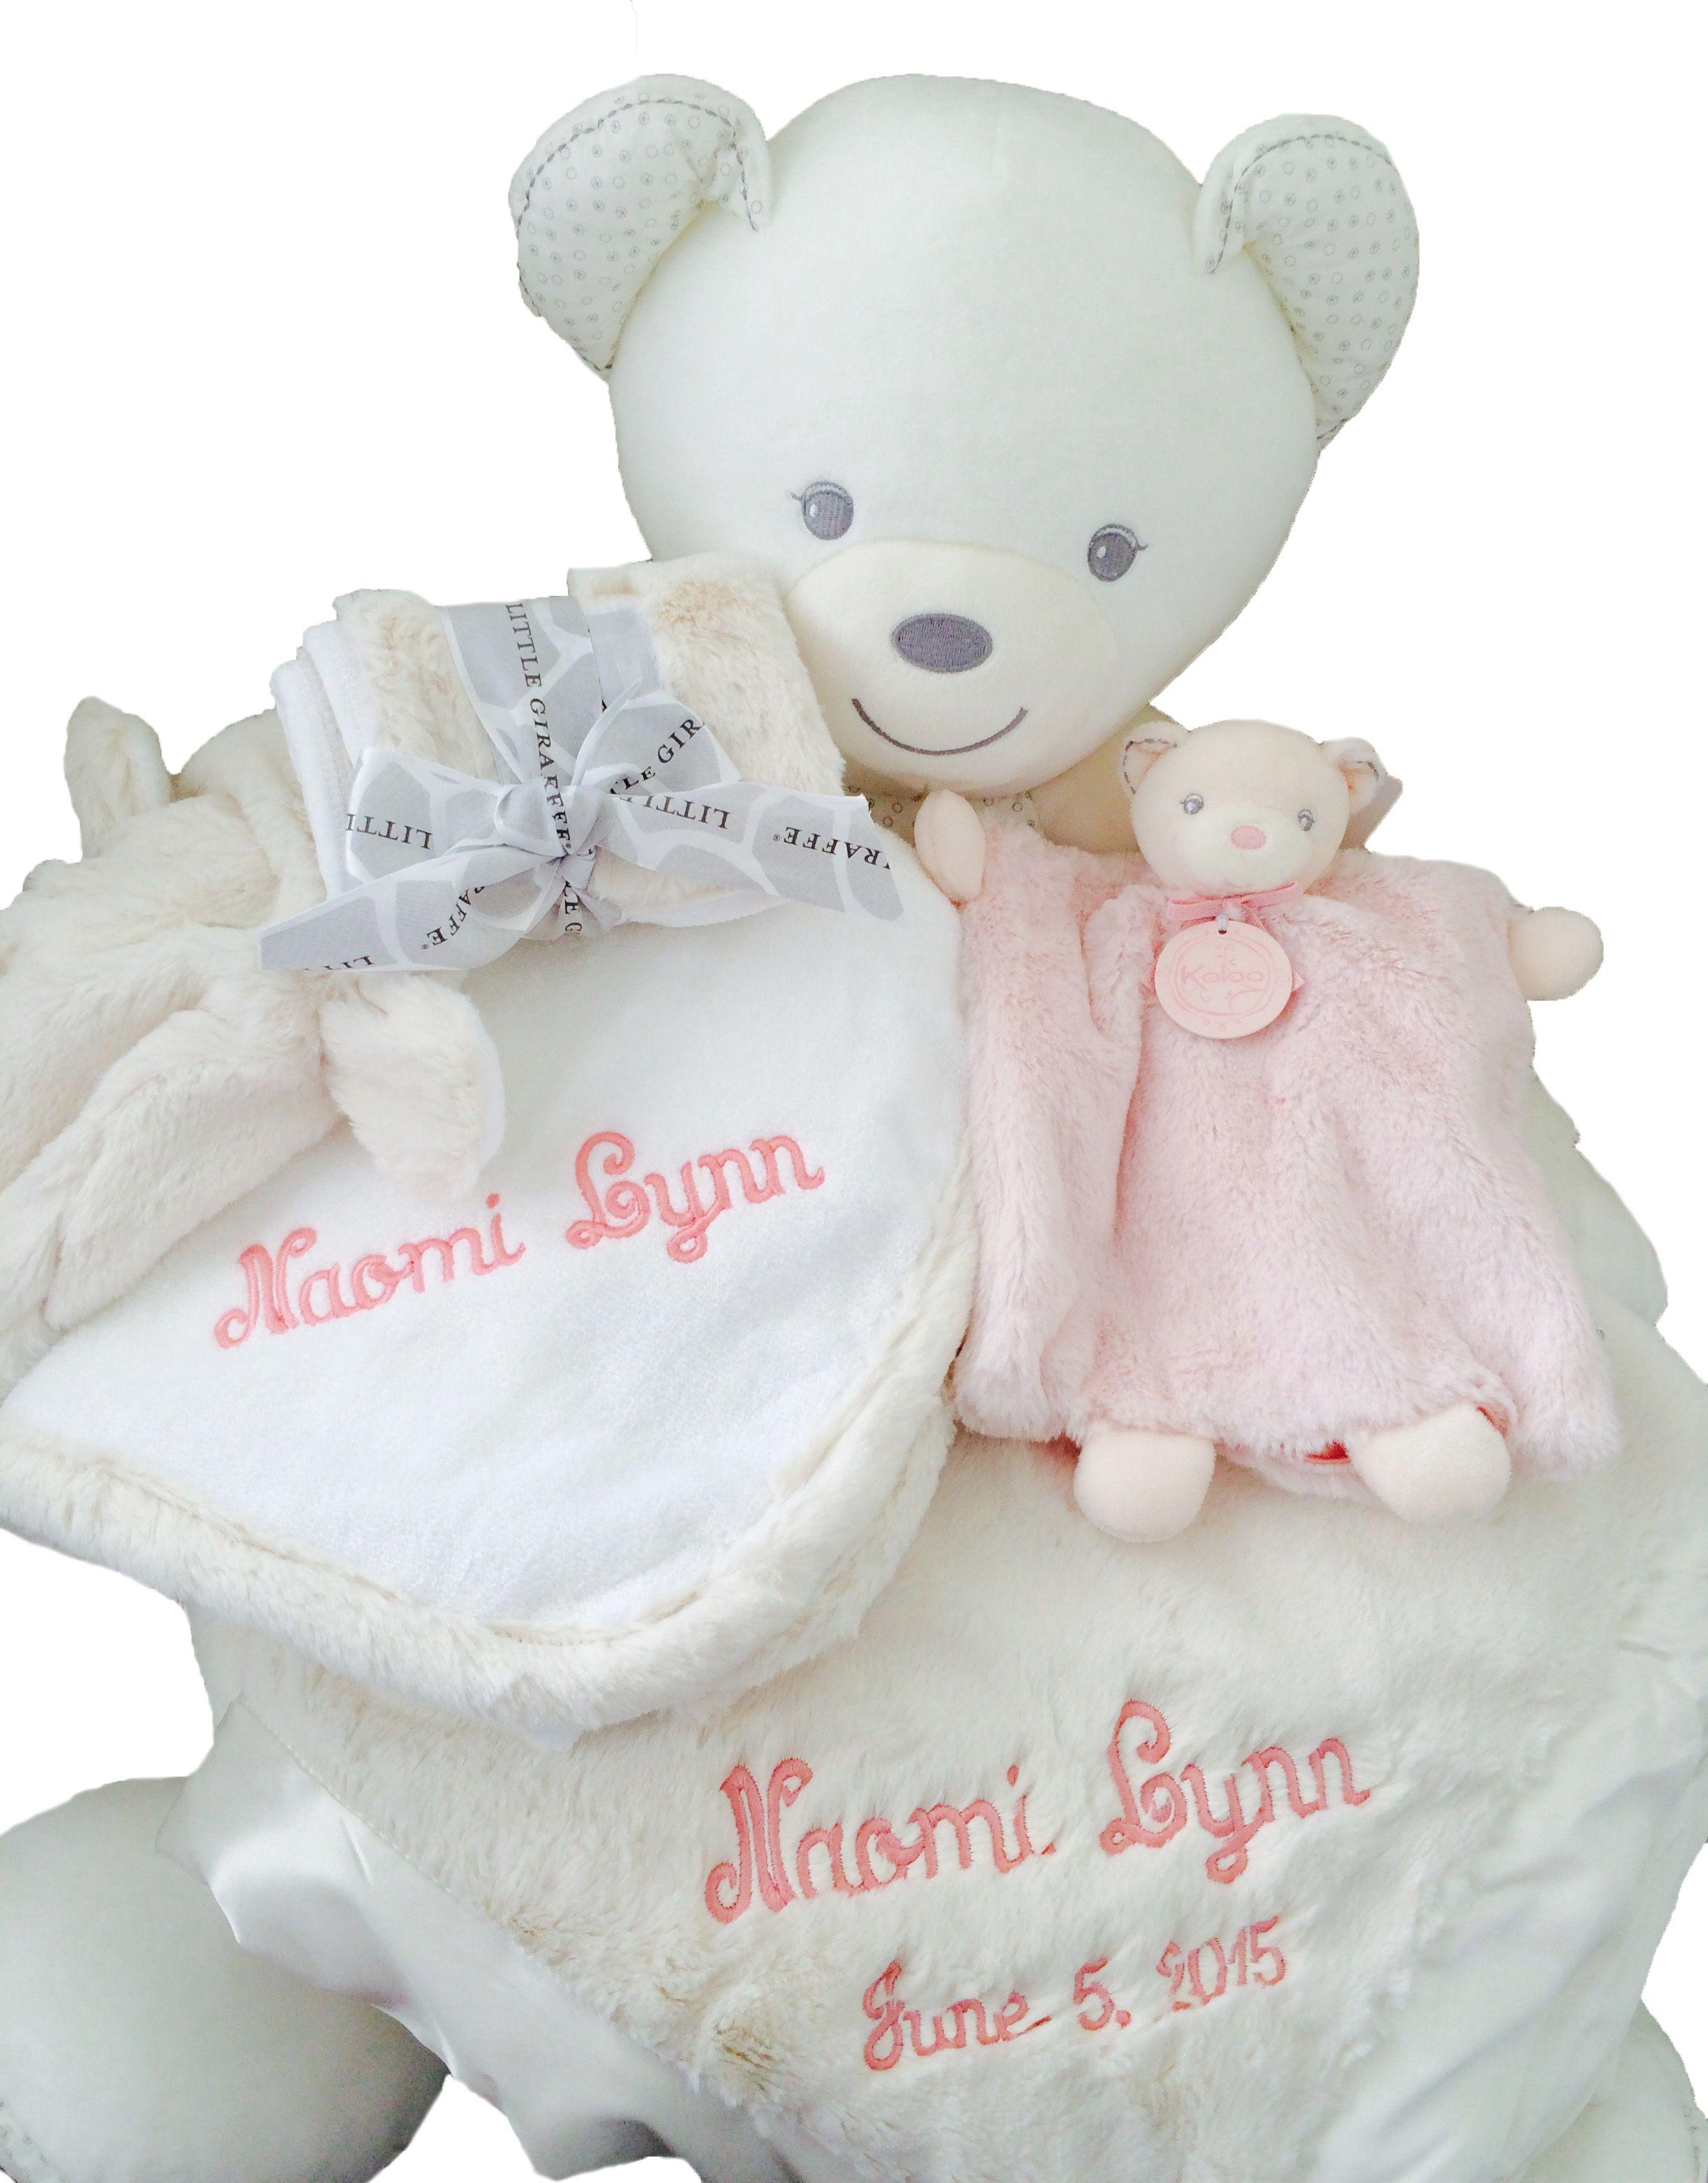 Personalized baby gift basket cream kaloo sofa cream little personalized baby gift basket cream kaloo sofa cream little giraffe luxe crib blanket negle Gallery